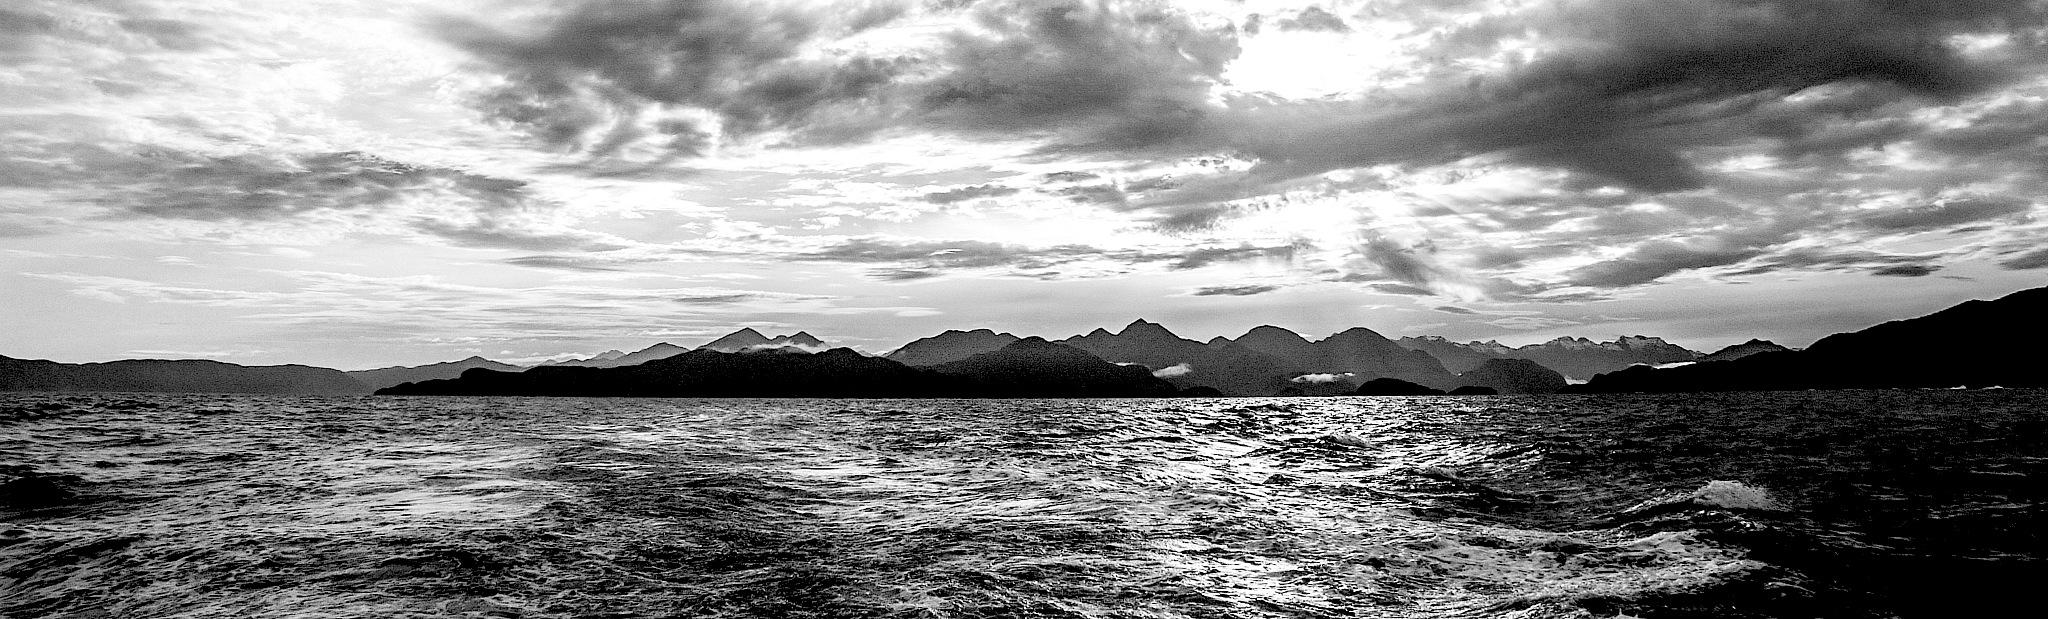 fiordland new zealand by sonny_roger_sonneland